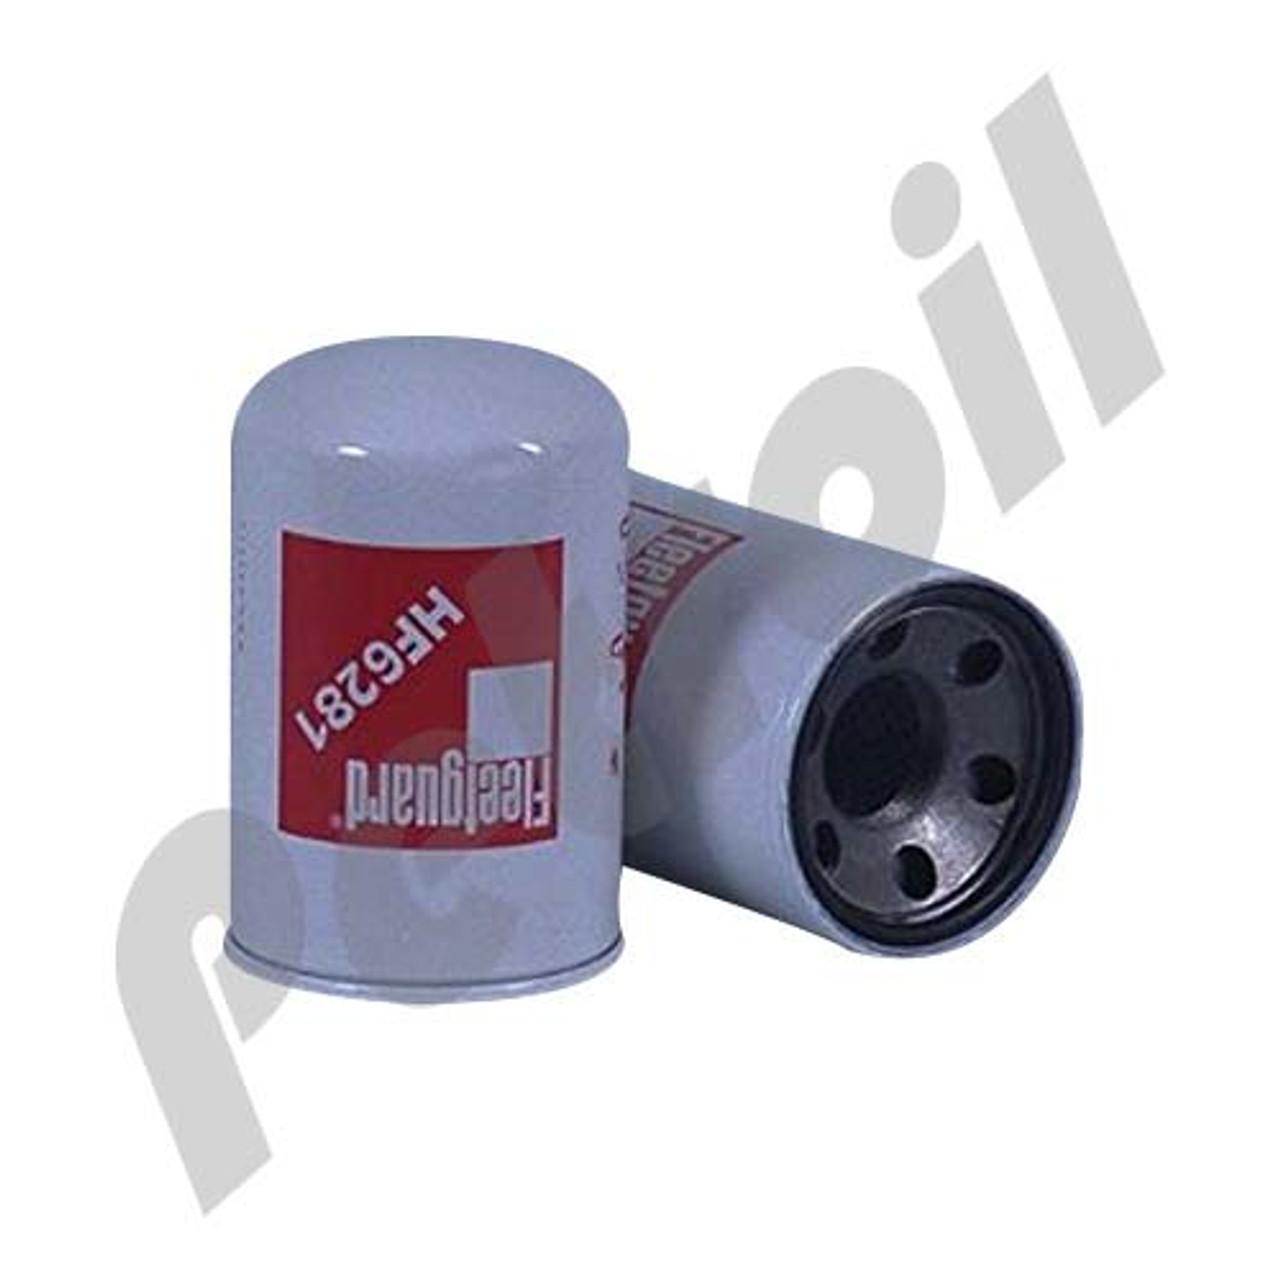 Fleetguard Hydraulic Filter Spin On Part No HF6281